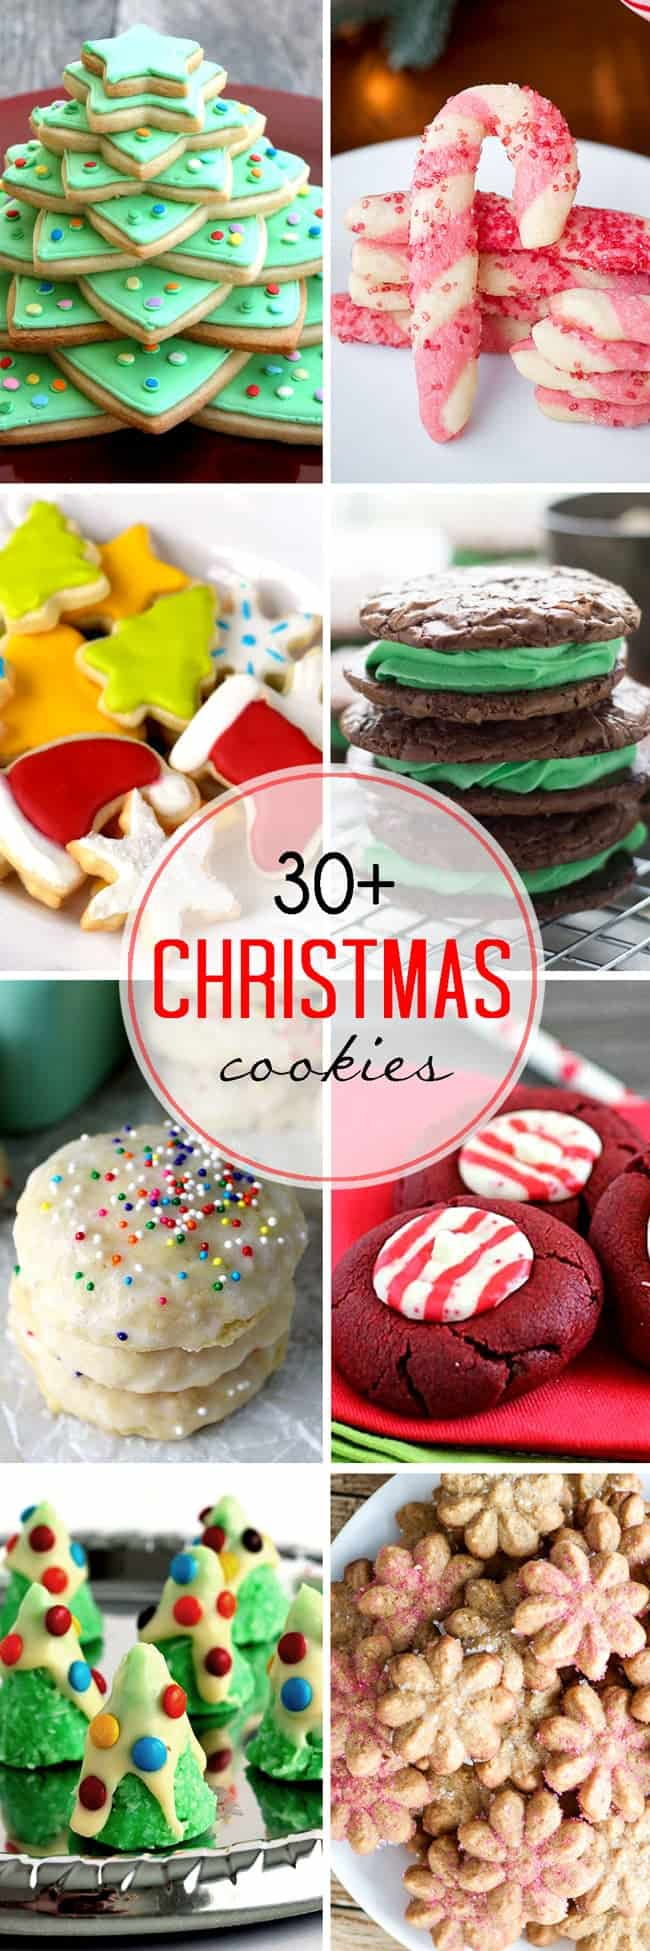 30 Plus Festive Christmas Cookie Recipes